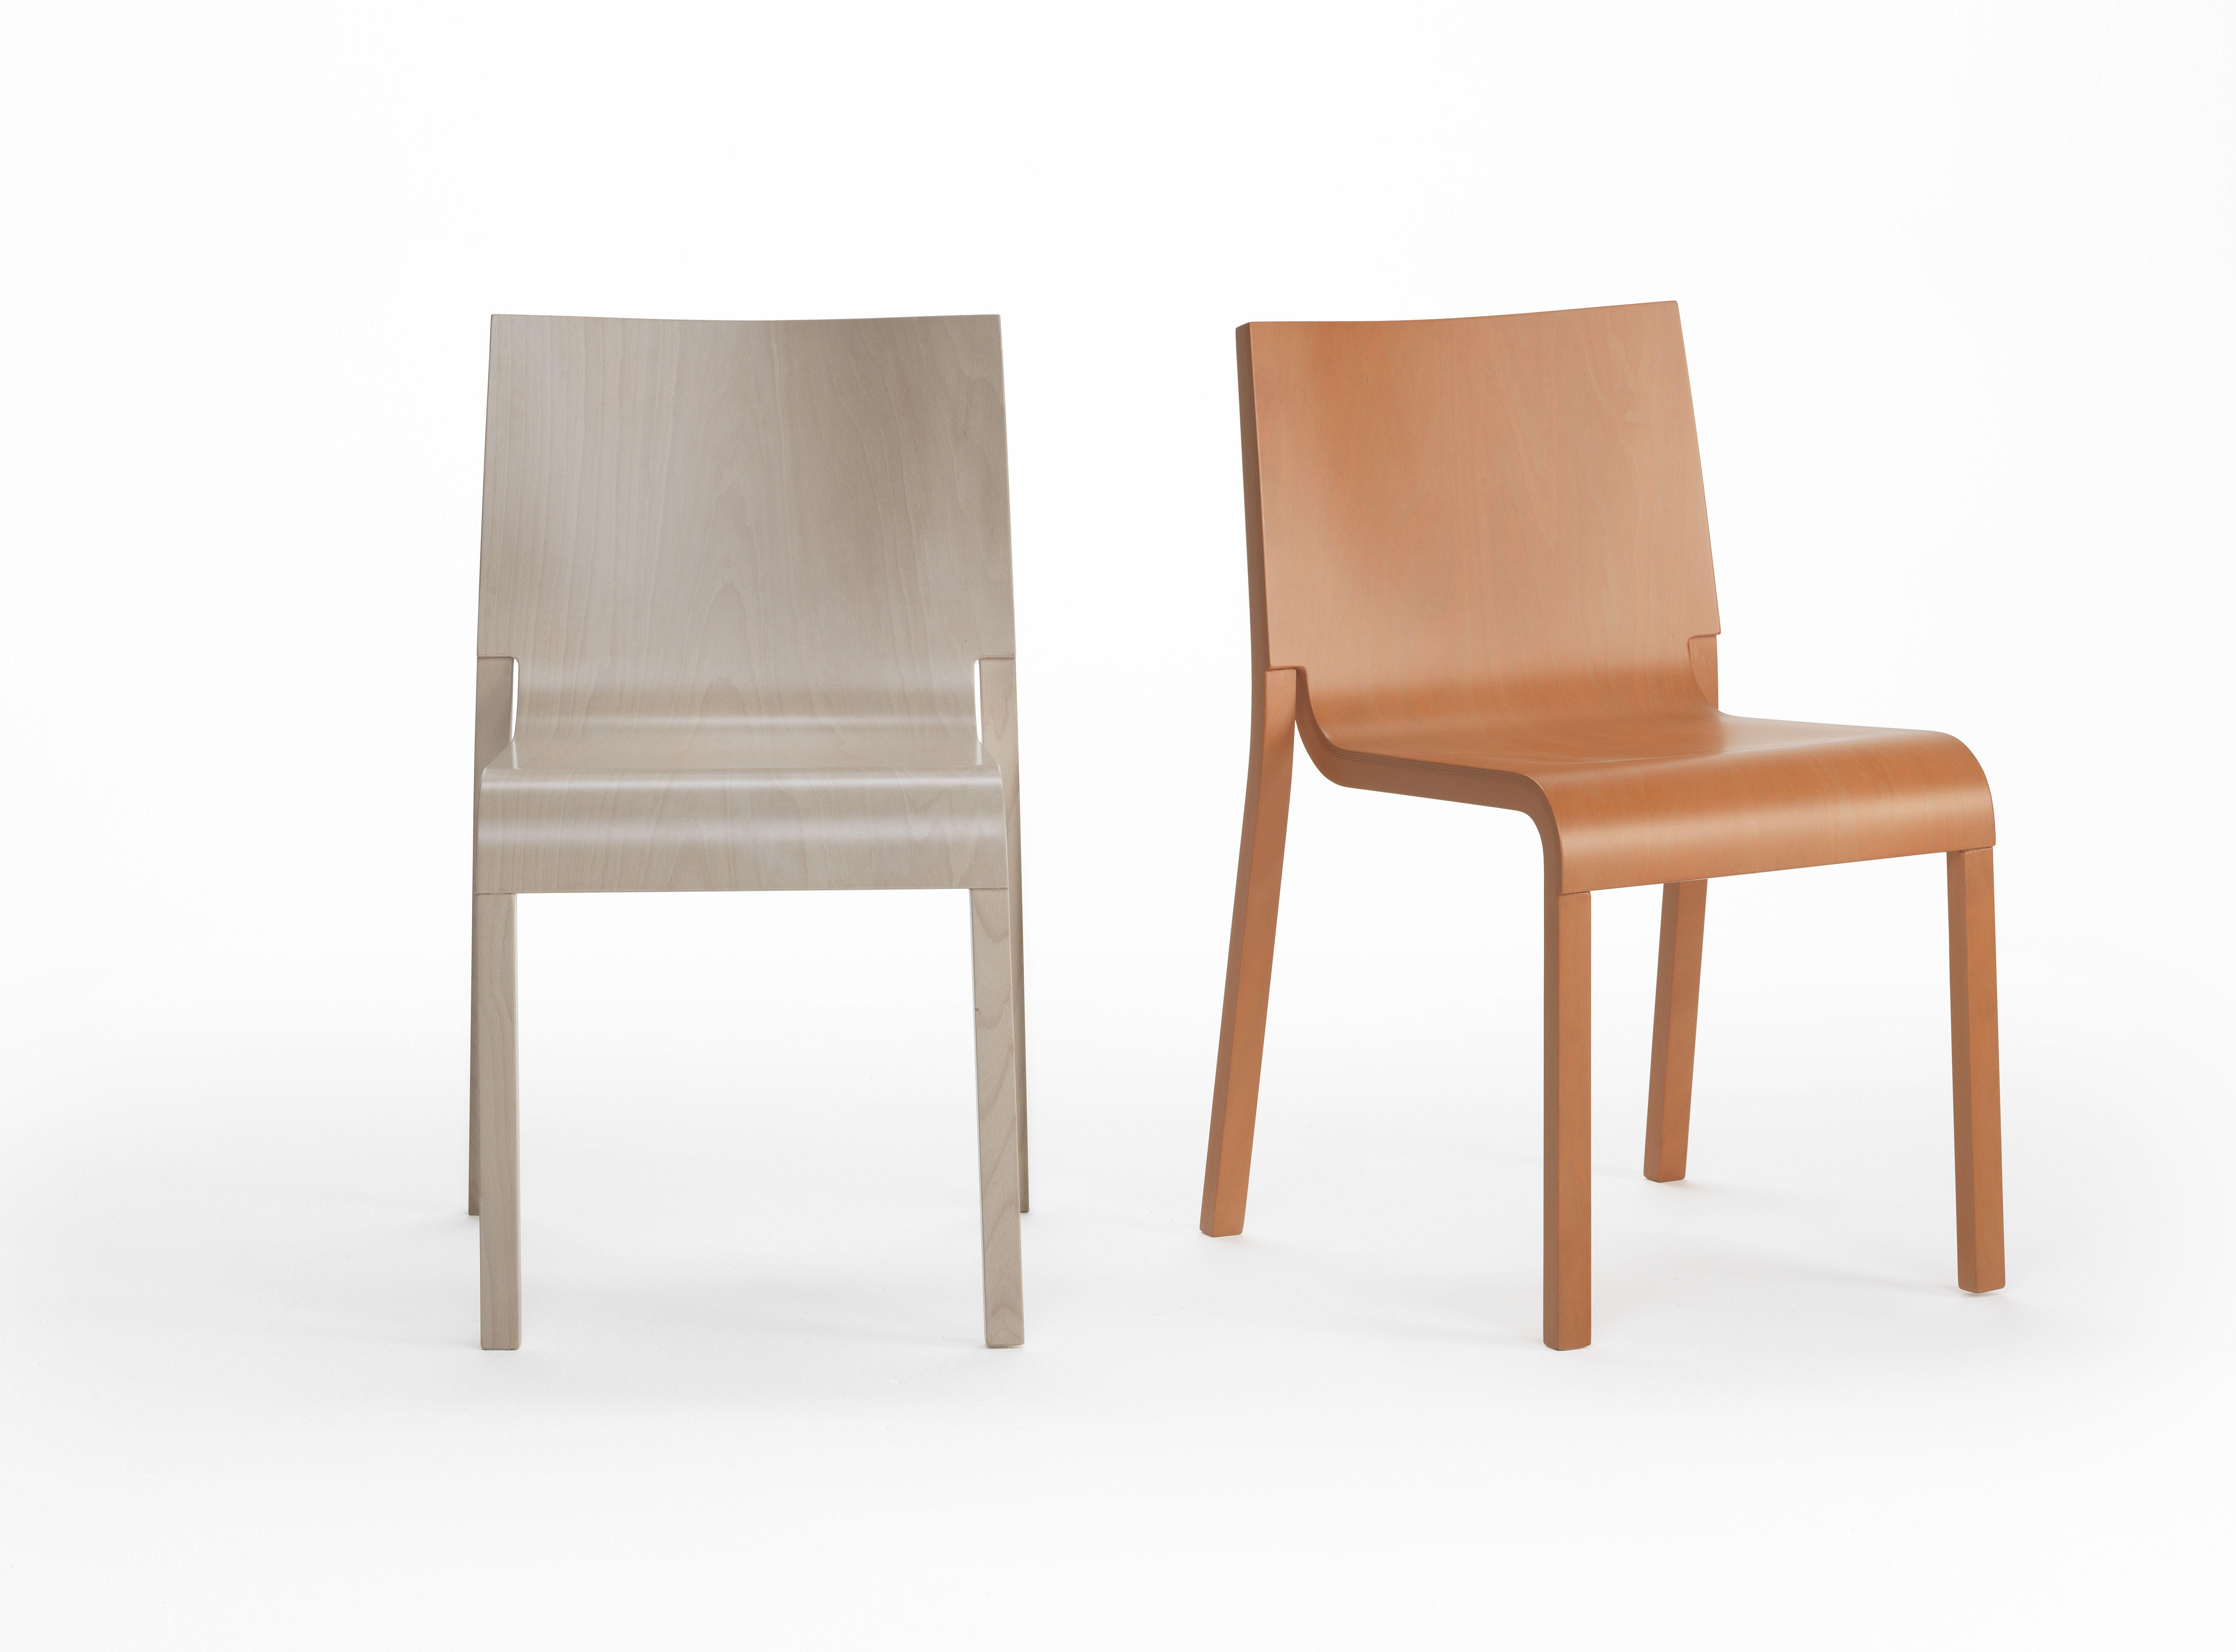 Segis Sedie ~ Porada sedie e poltrone marylin porada arredi zona giorno